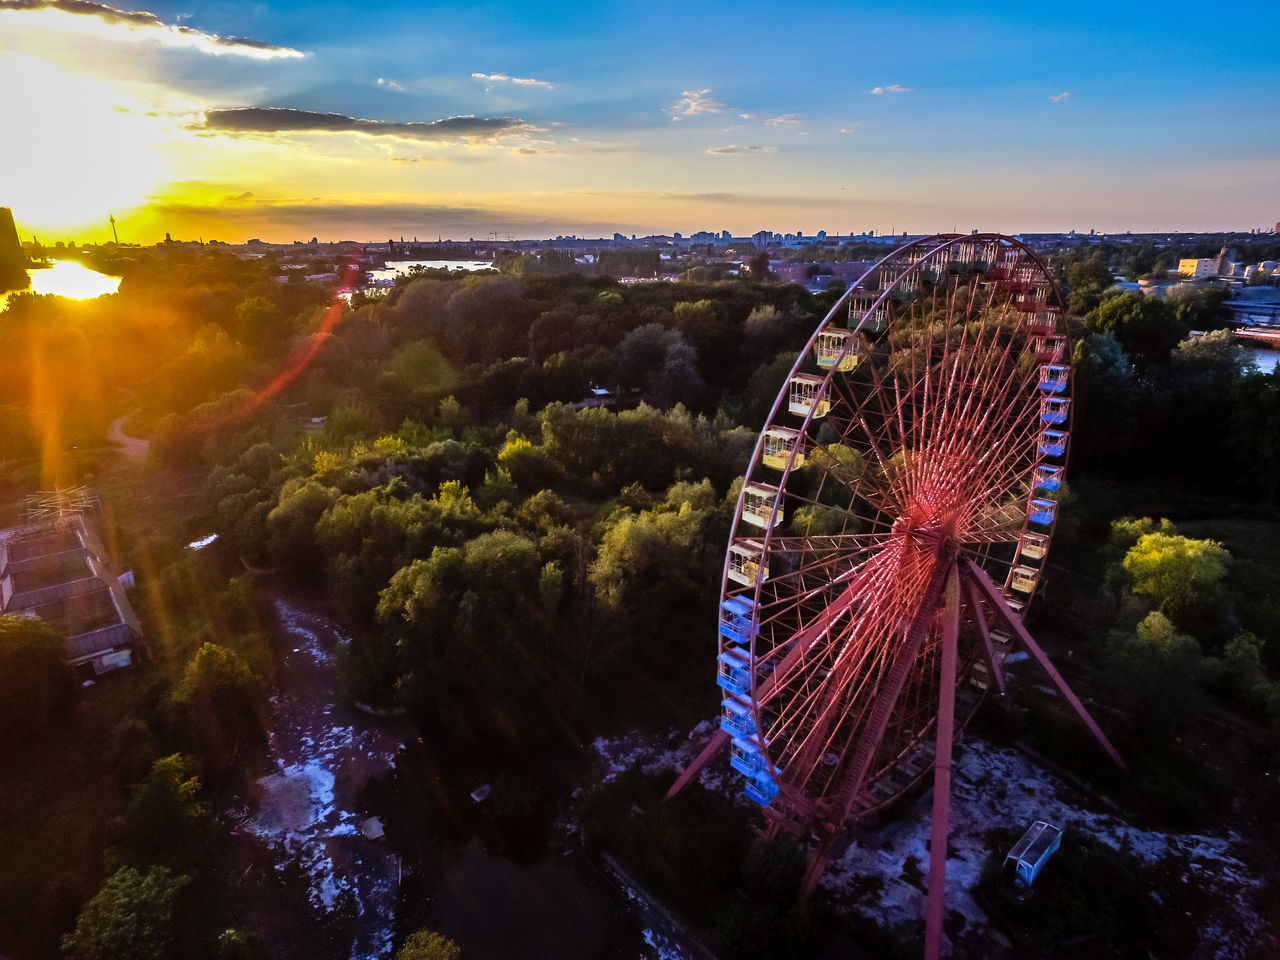 Abandoned Places Beautiful Berln Ferris Wheel Landscape Moody Sky Spreepark Spreepark Plänterwald Sunset Drone  Www.airteam.camera